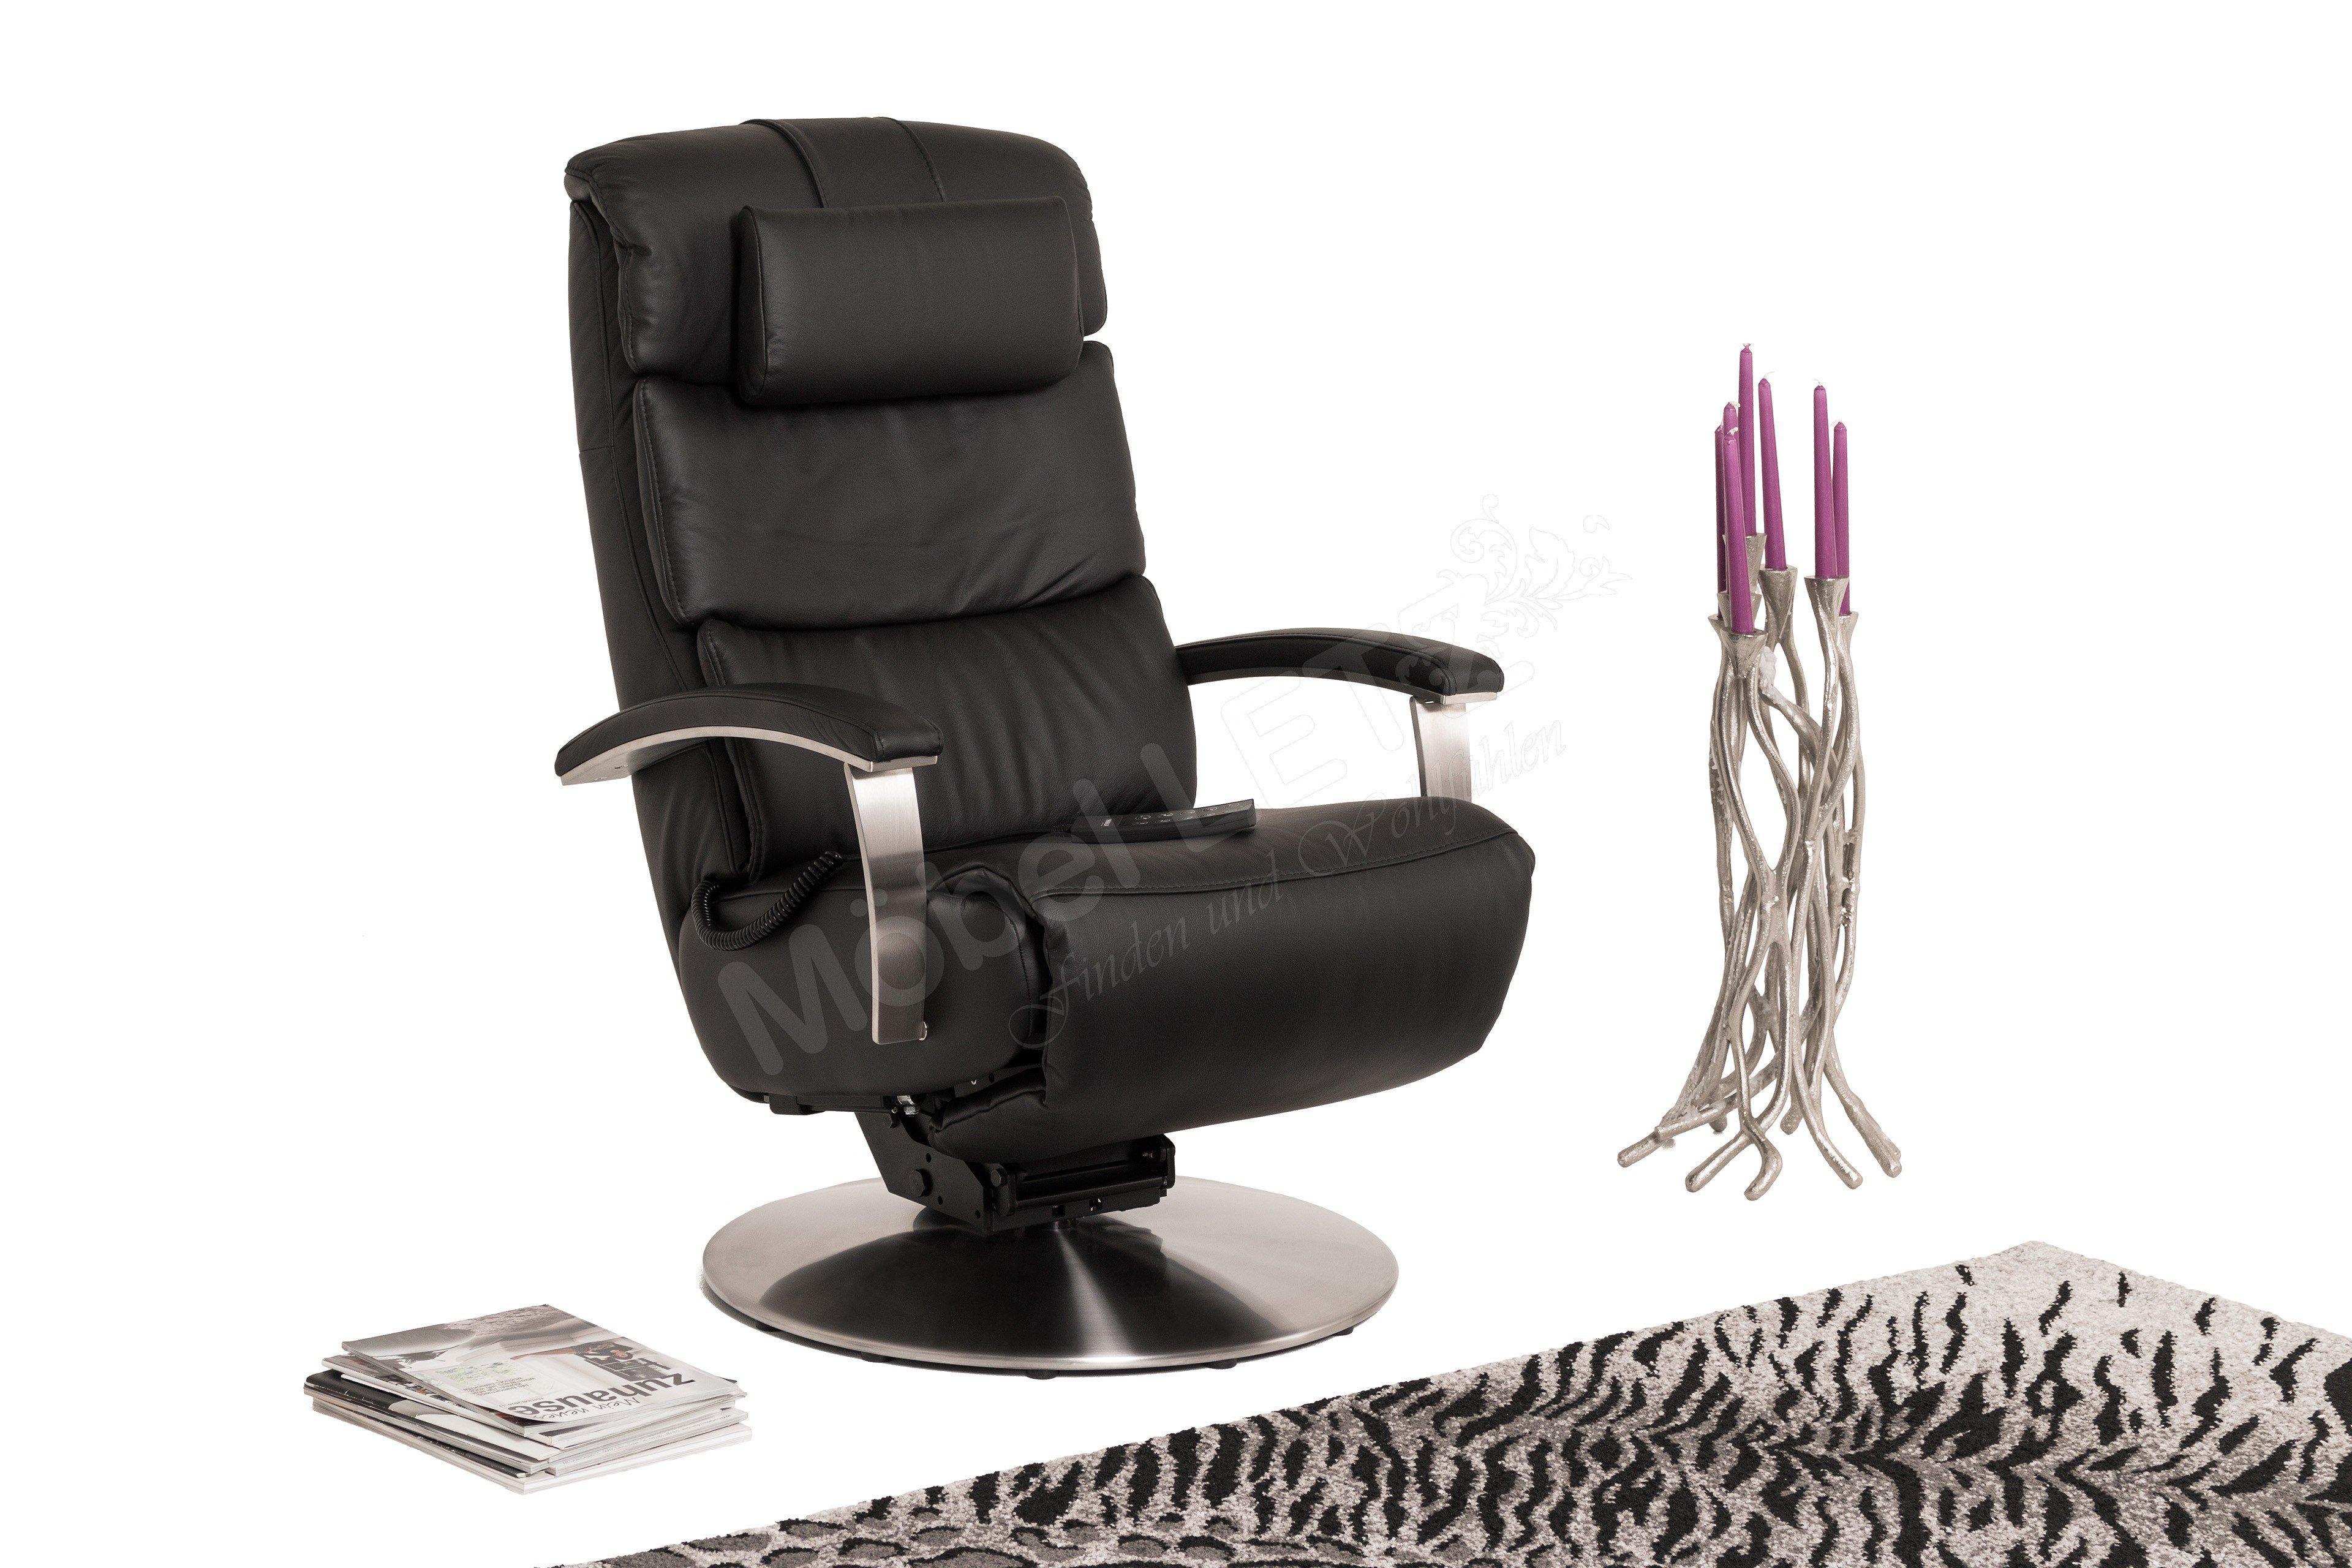 relaxsessel schwarz best relaxsessel tvsessel schwarz. Black Bedroom Furniture Sets. Home Design Ideas